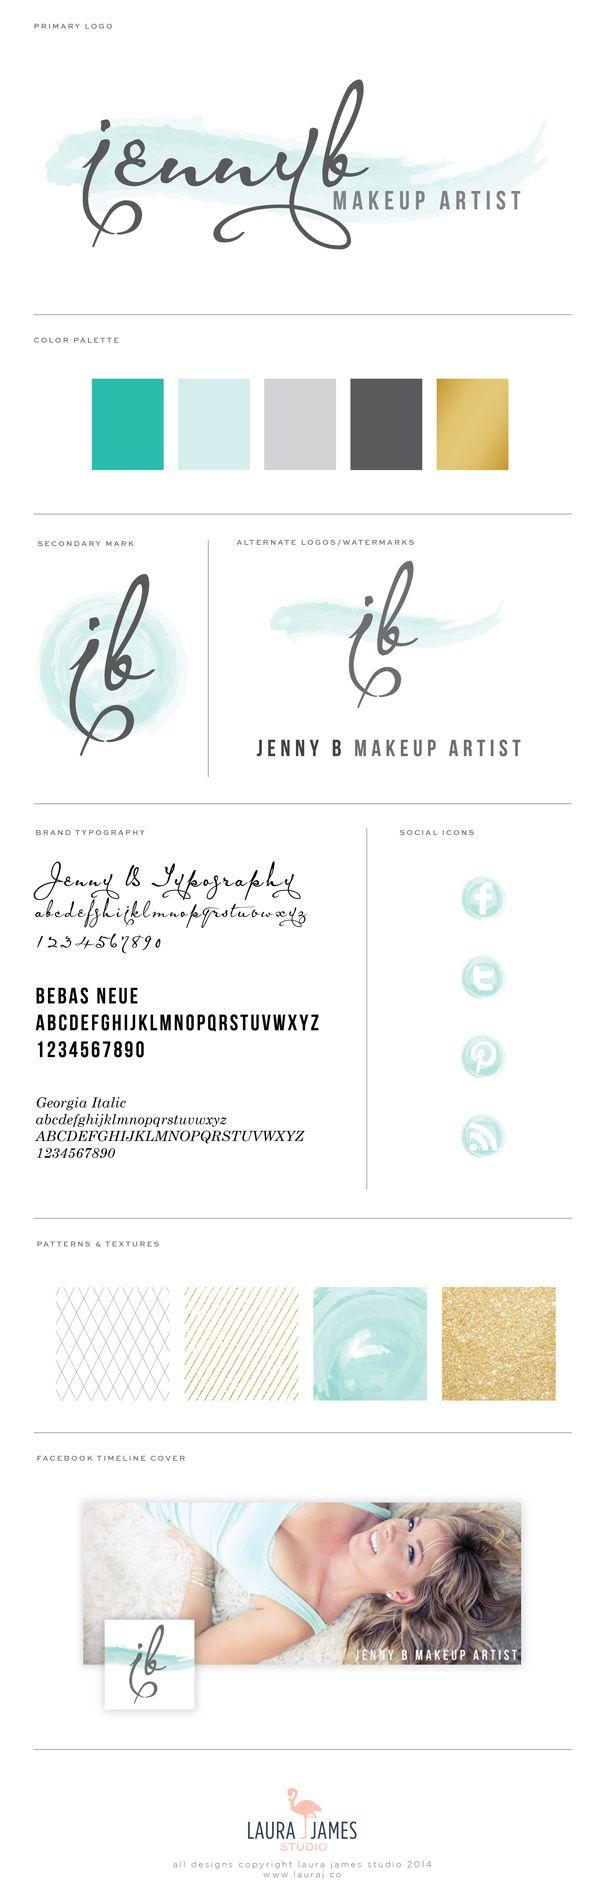 Watercolor Aqua Teal Gold Black Grey Logo Brand Identity Visual Guide Great Photography Idea Makeup Artist